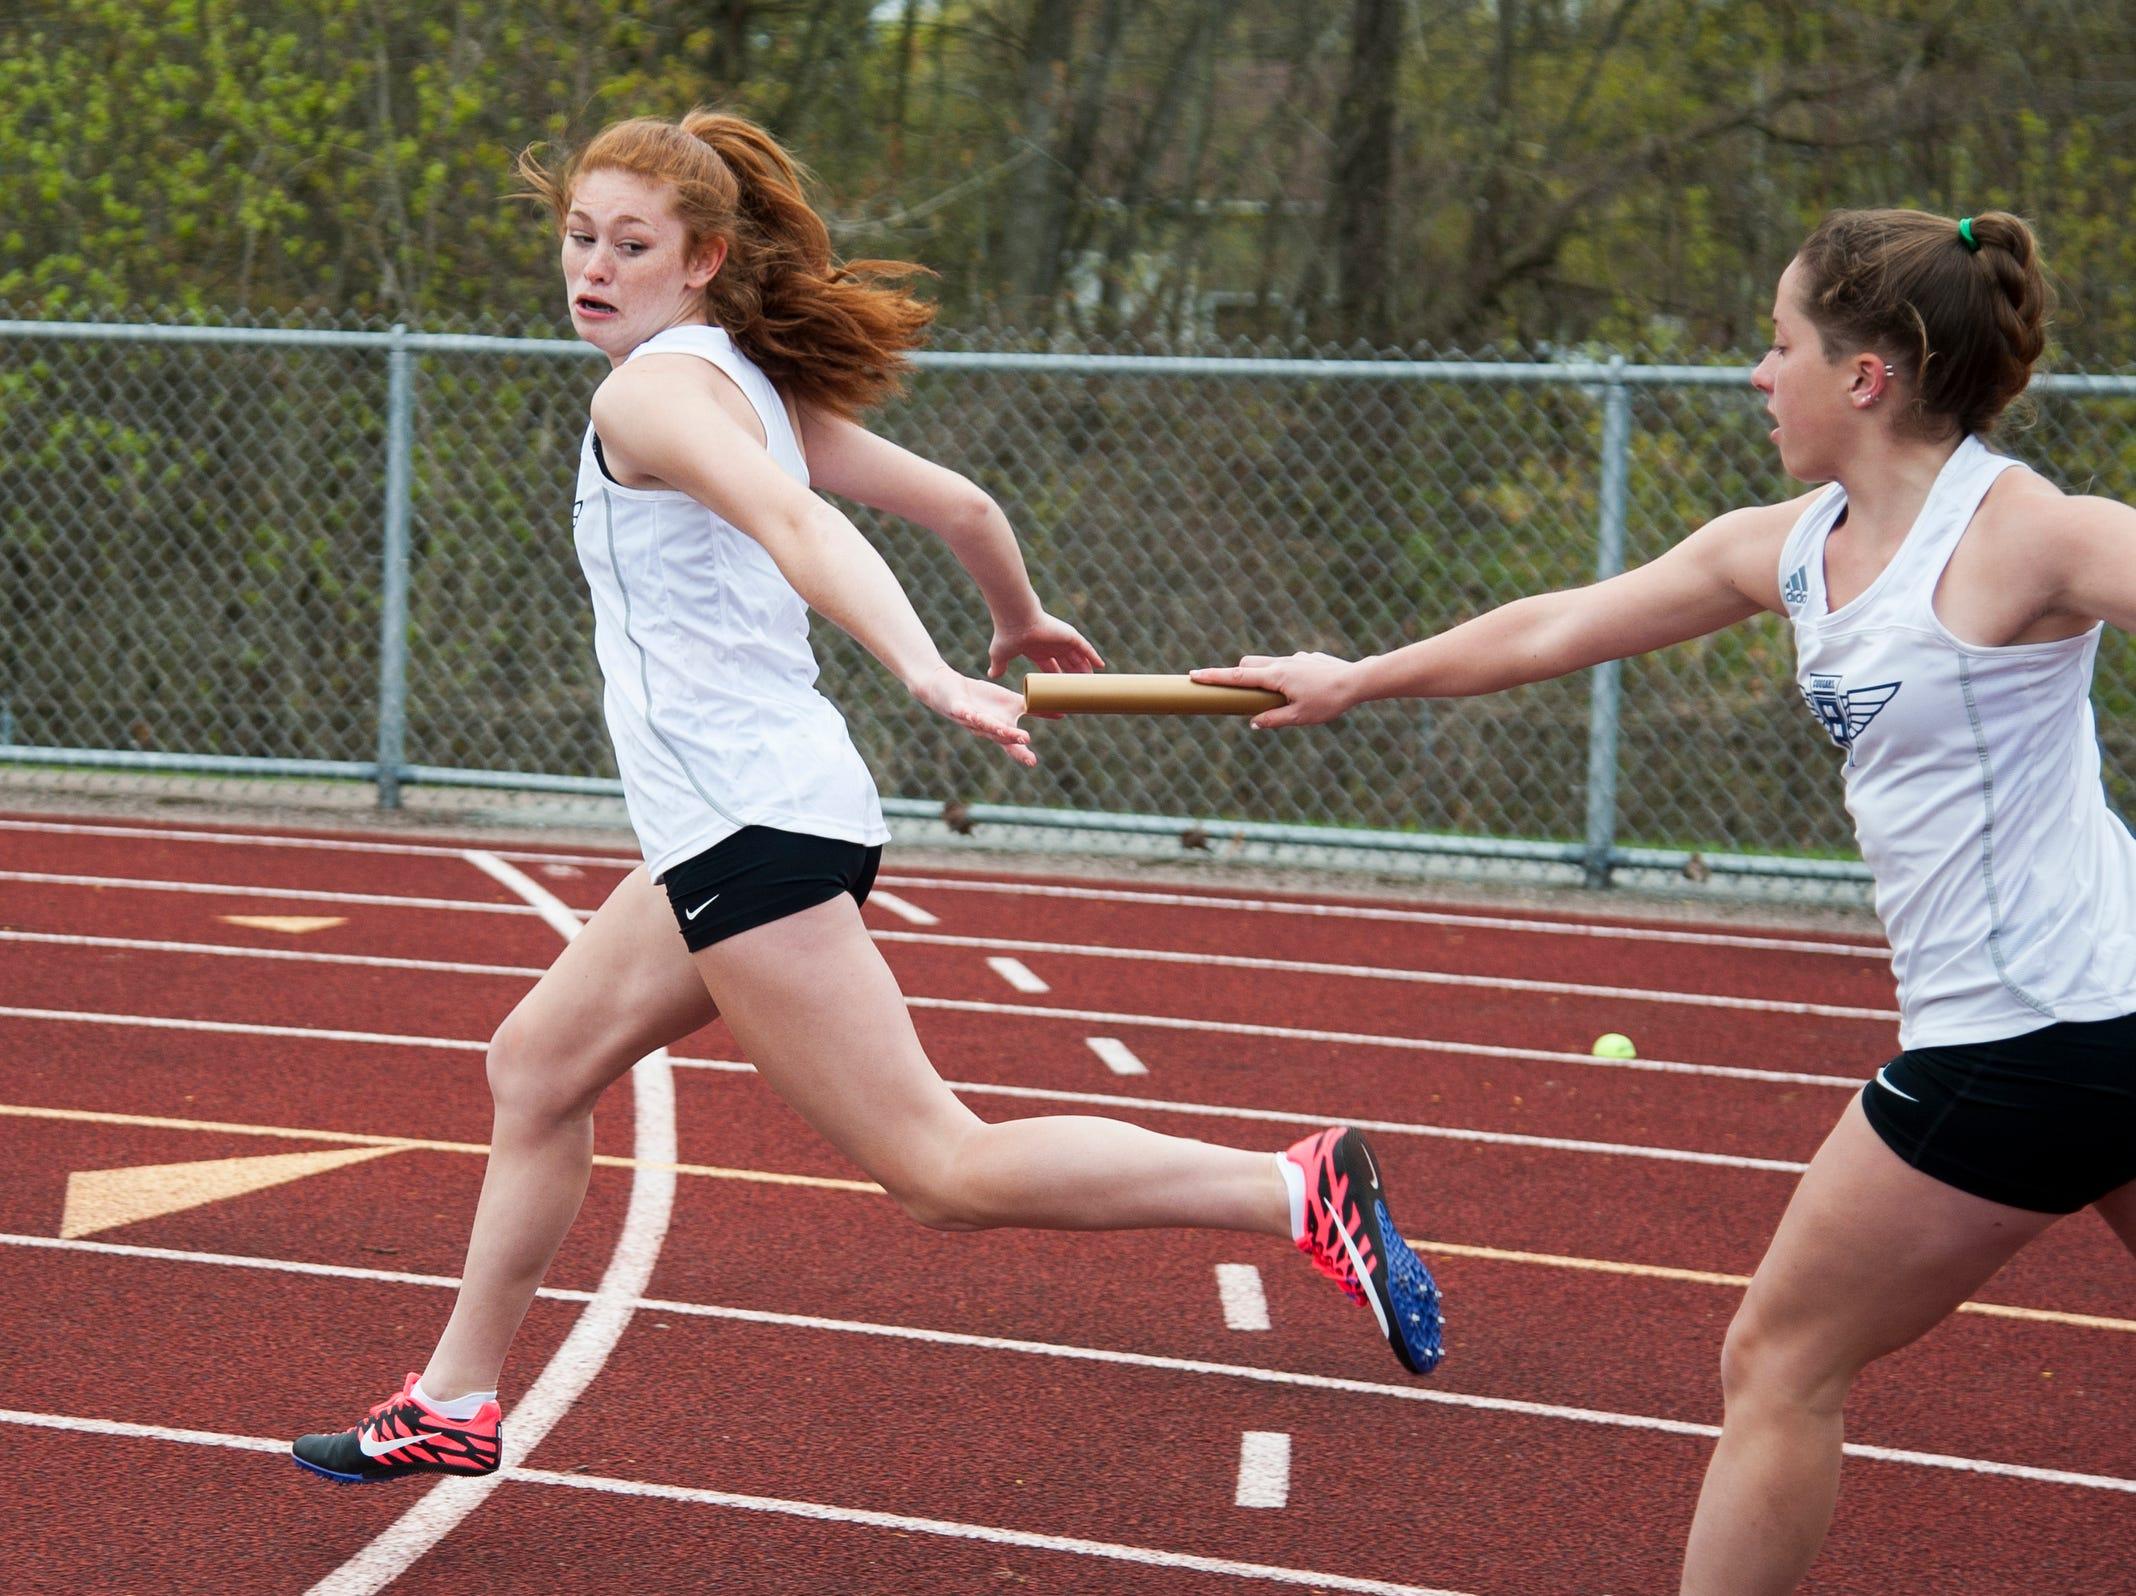 MMU's Ava Esmay hands off the baton to Jada Diamond in the girl 4x100m race during the Burlington Invitational high school track and field meet at Buck Hard Field on Saturday May 11, 2019 in Burlington, Vermont.